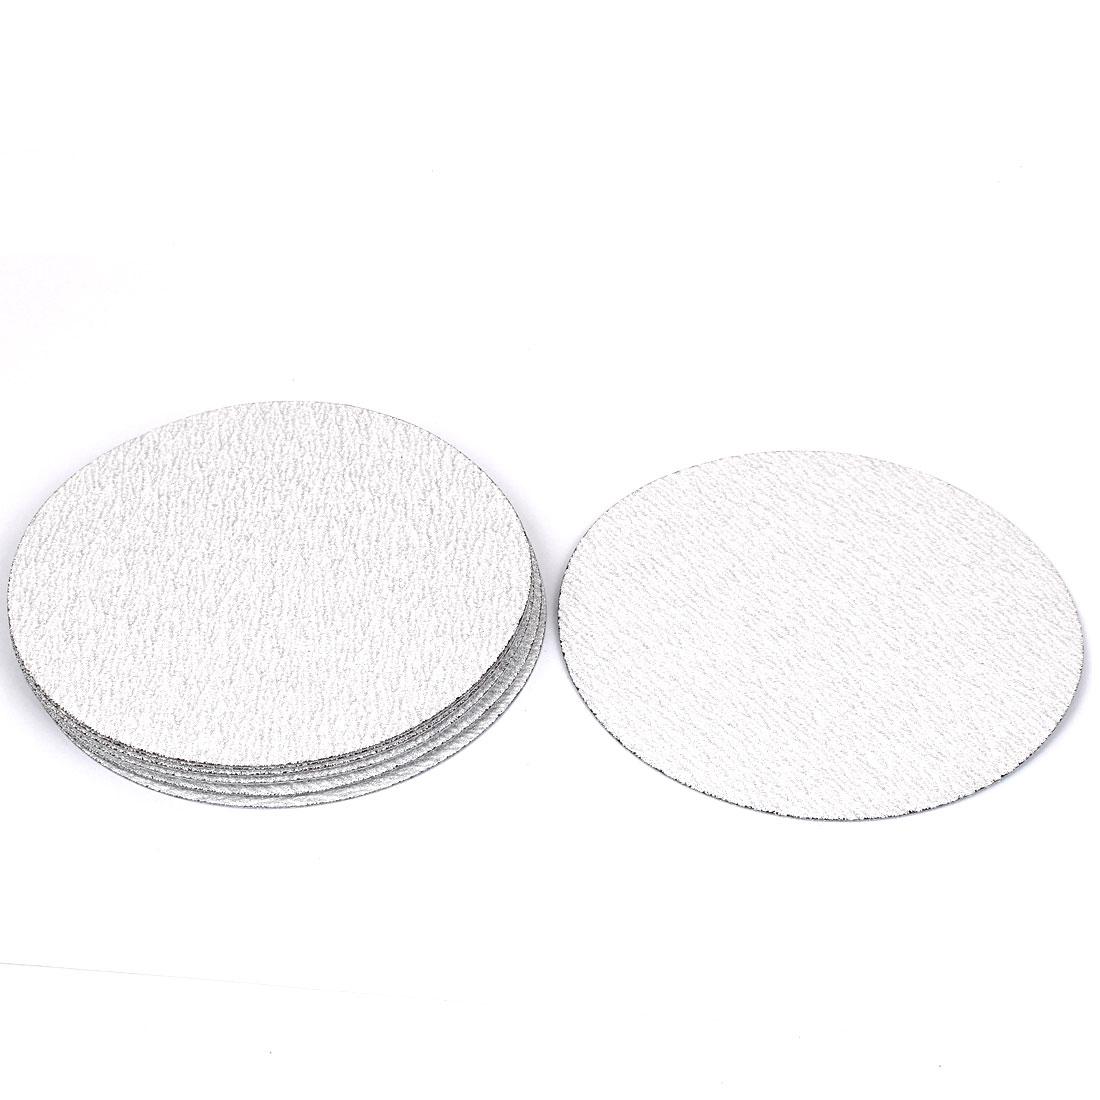 "6"" Dia Polishing Round Dry Abrasive Sanding Sandpaper Sheet Disc 180 Grit 10pcs"